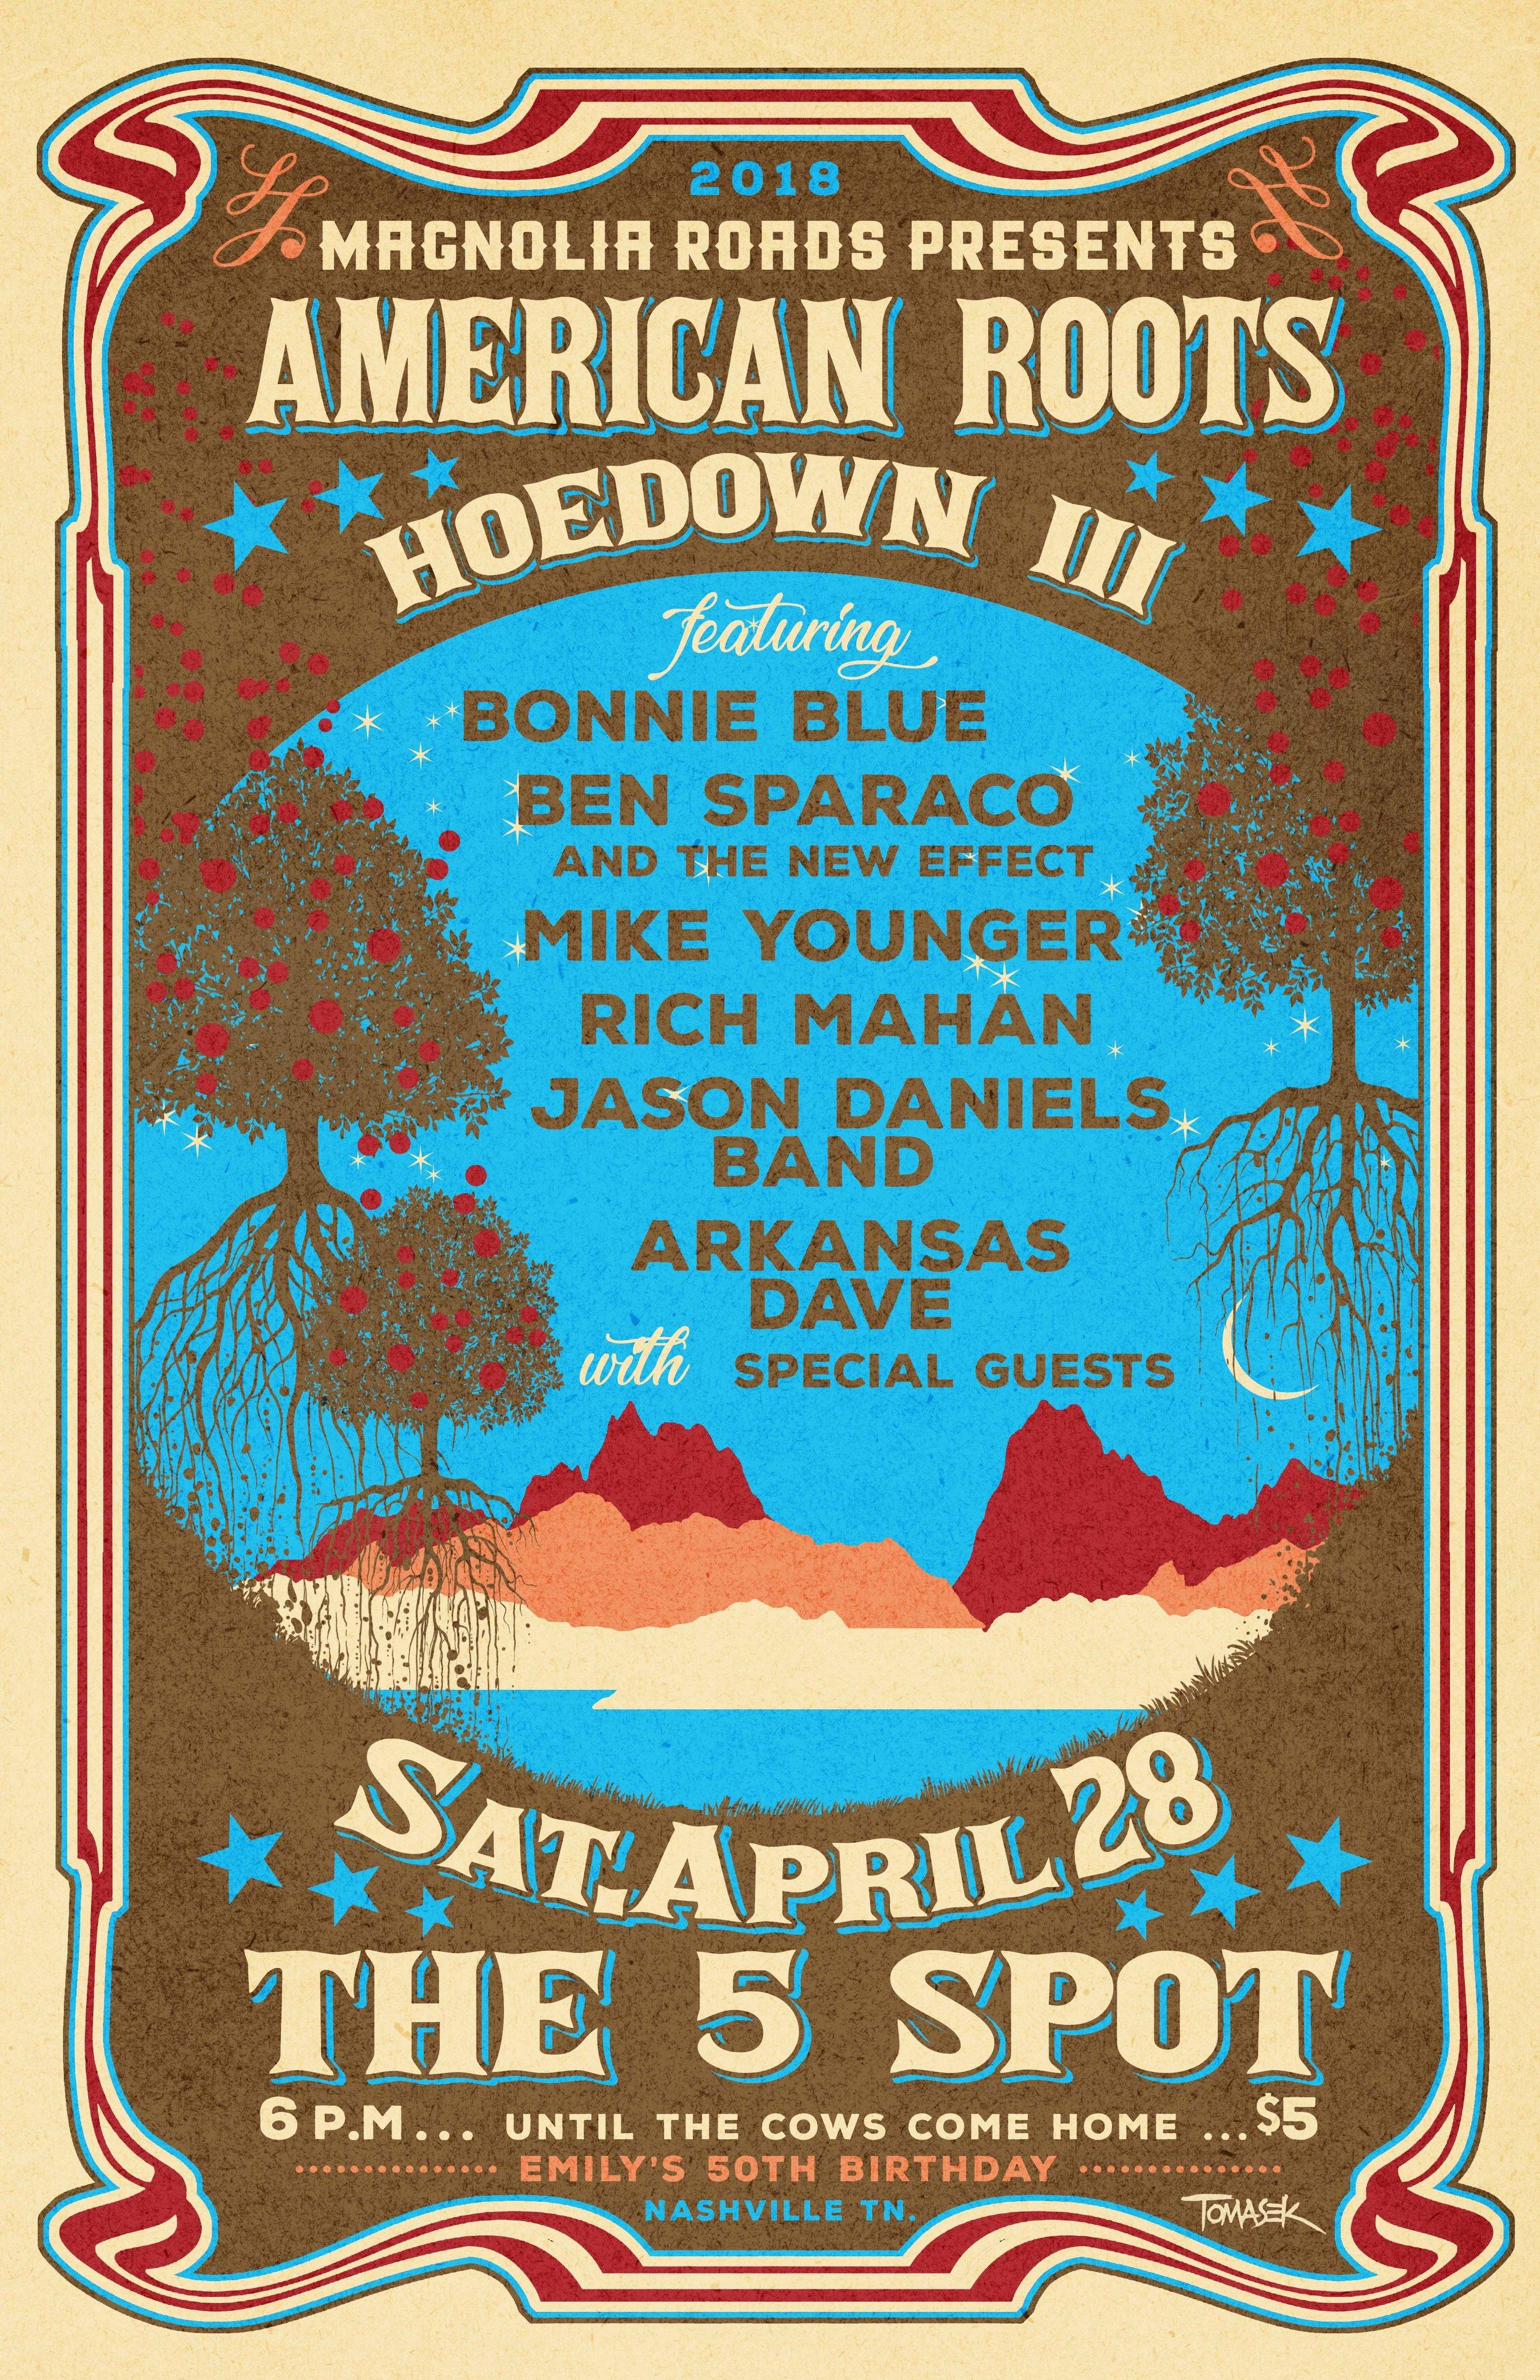 Magnolia Roads American Roots Hoedown III 2018 poster.jpg